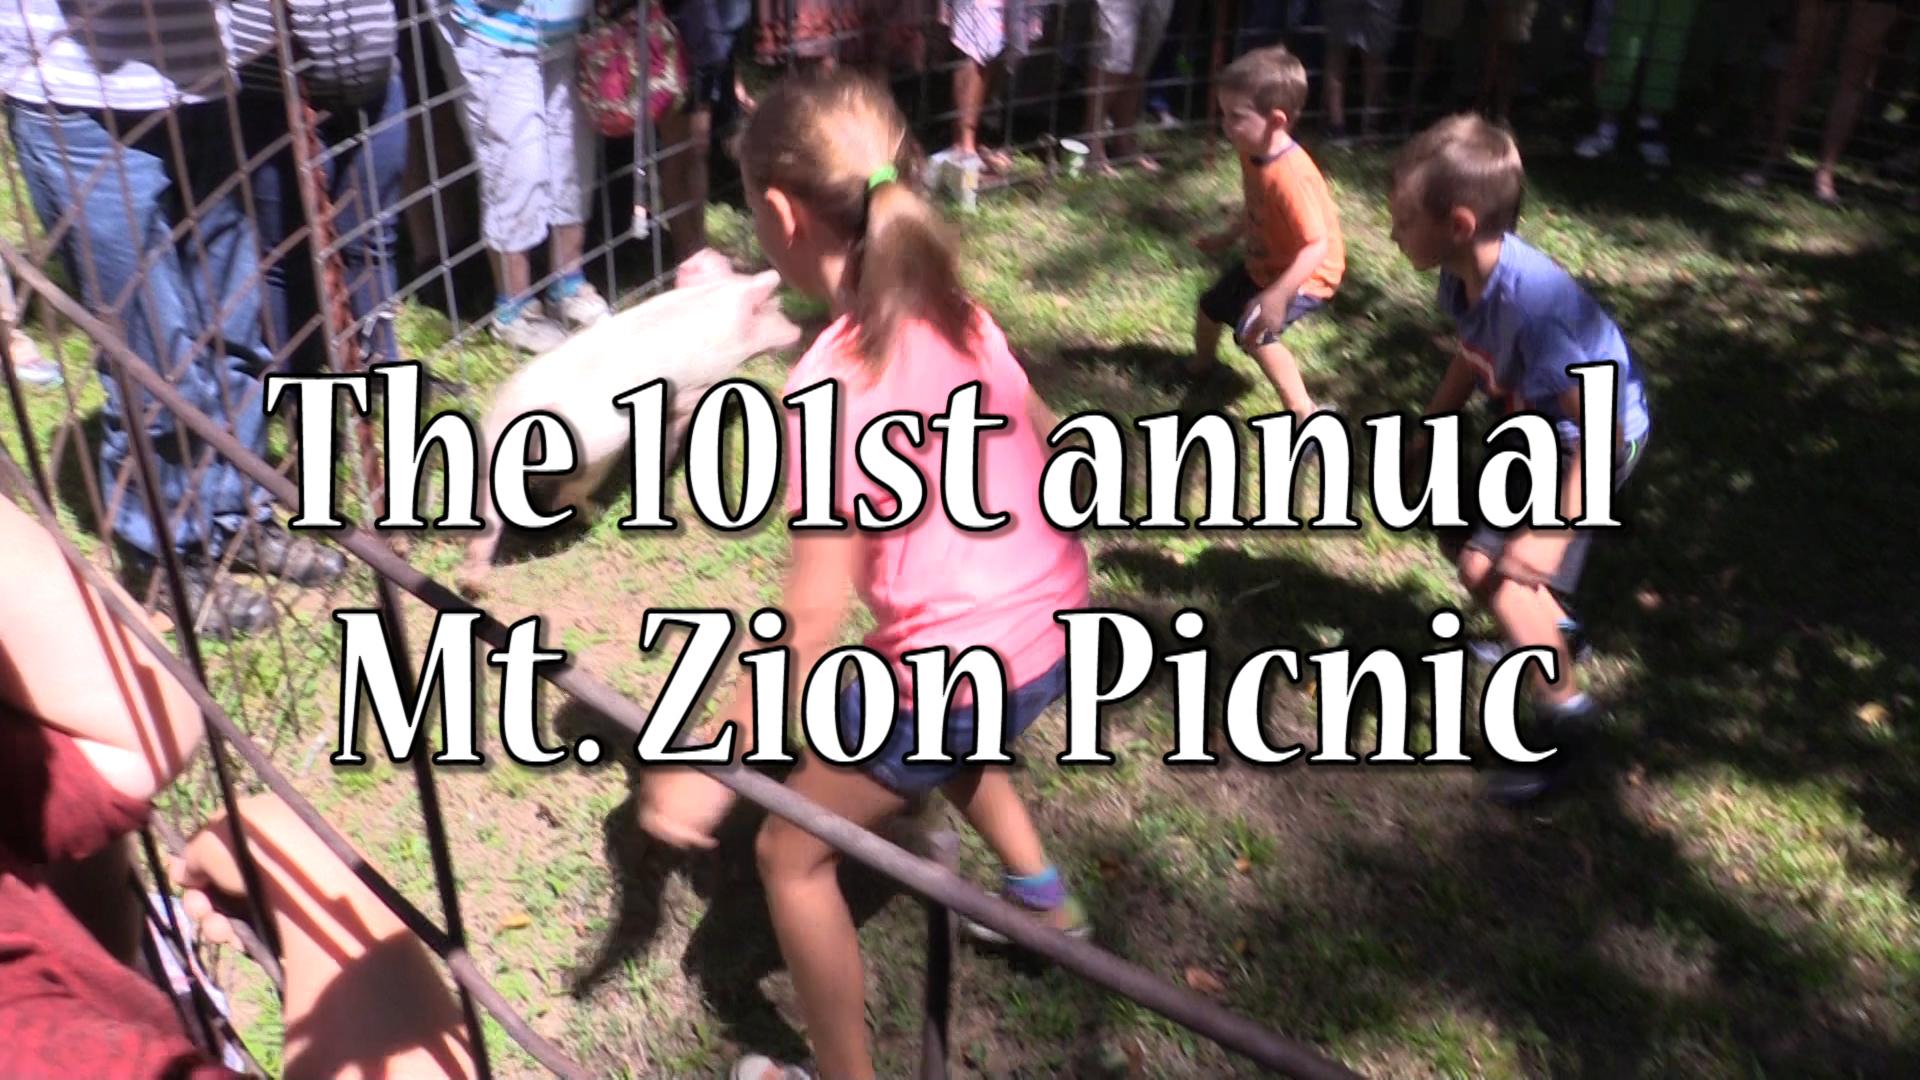 VIDEO - Mt. Zion hosts 101st annual picnic